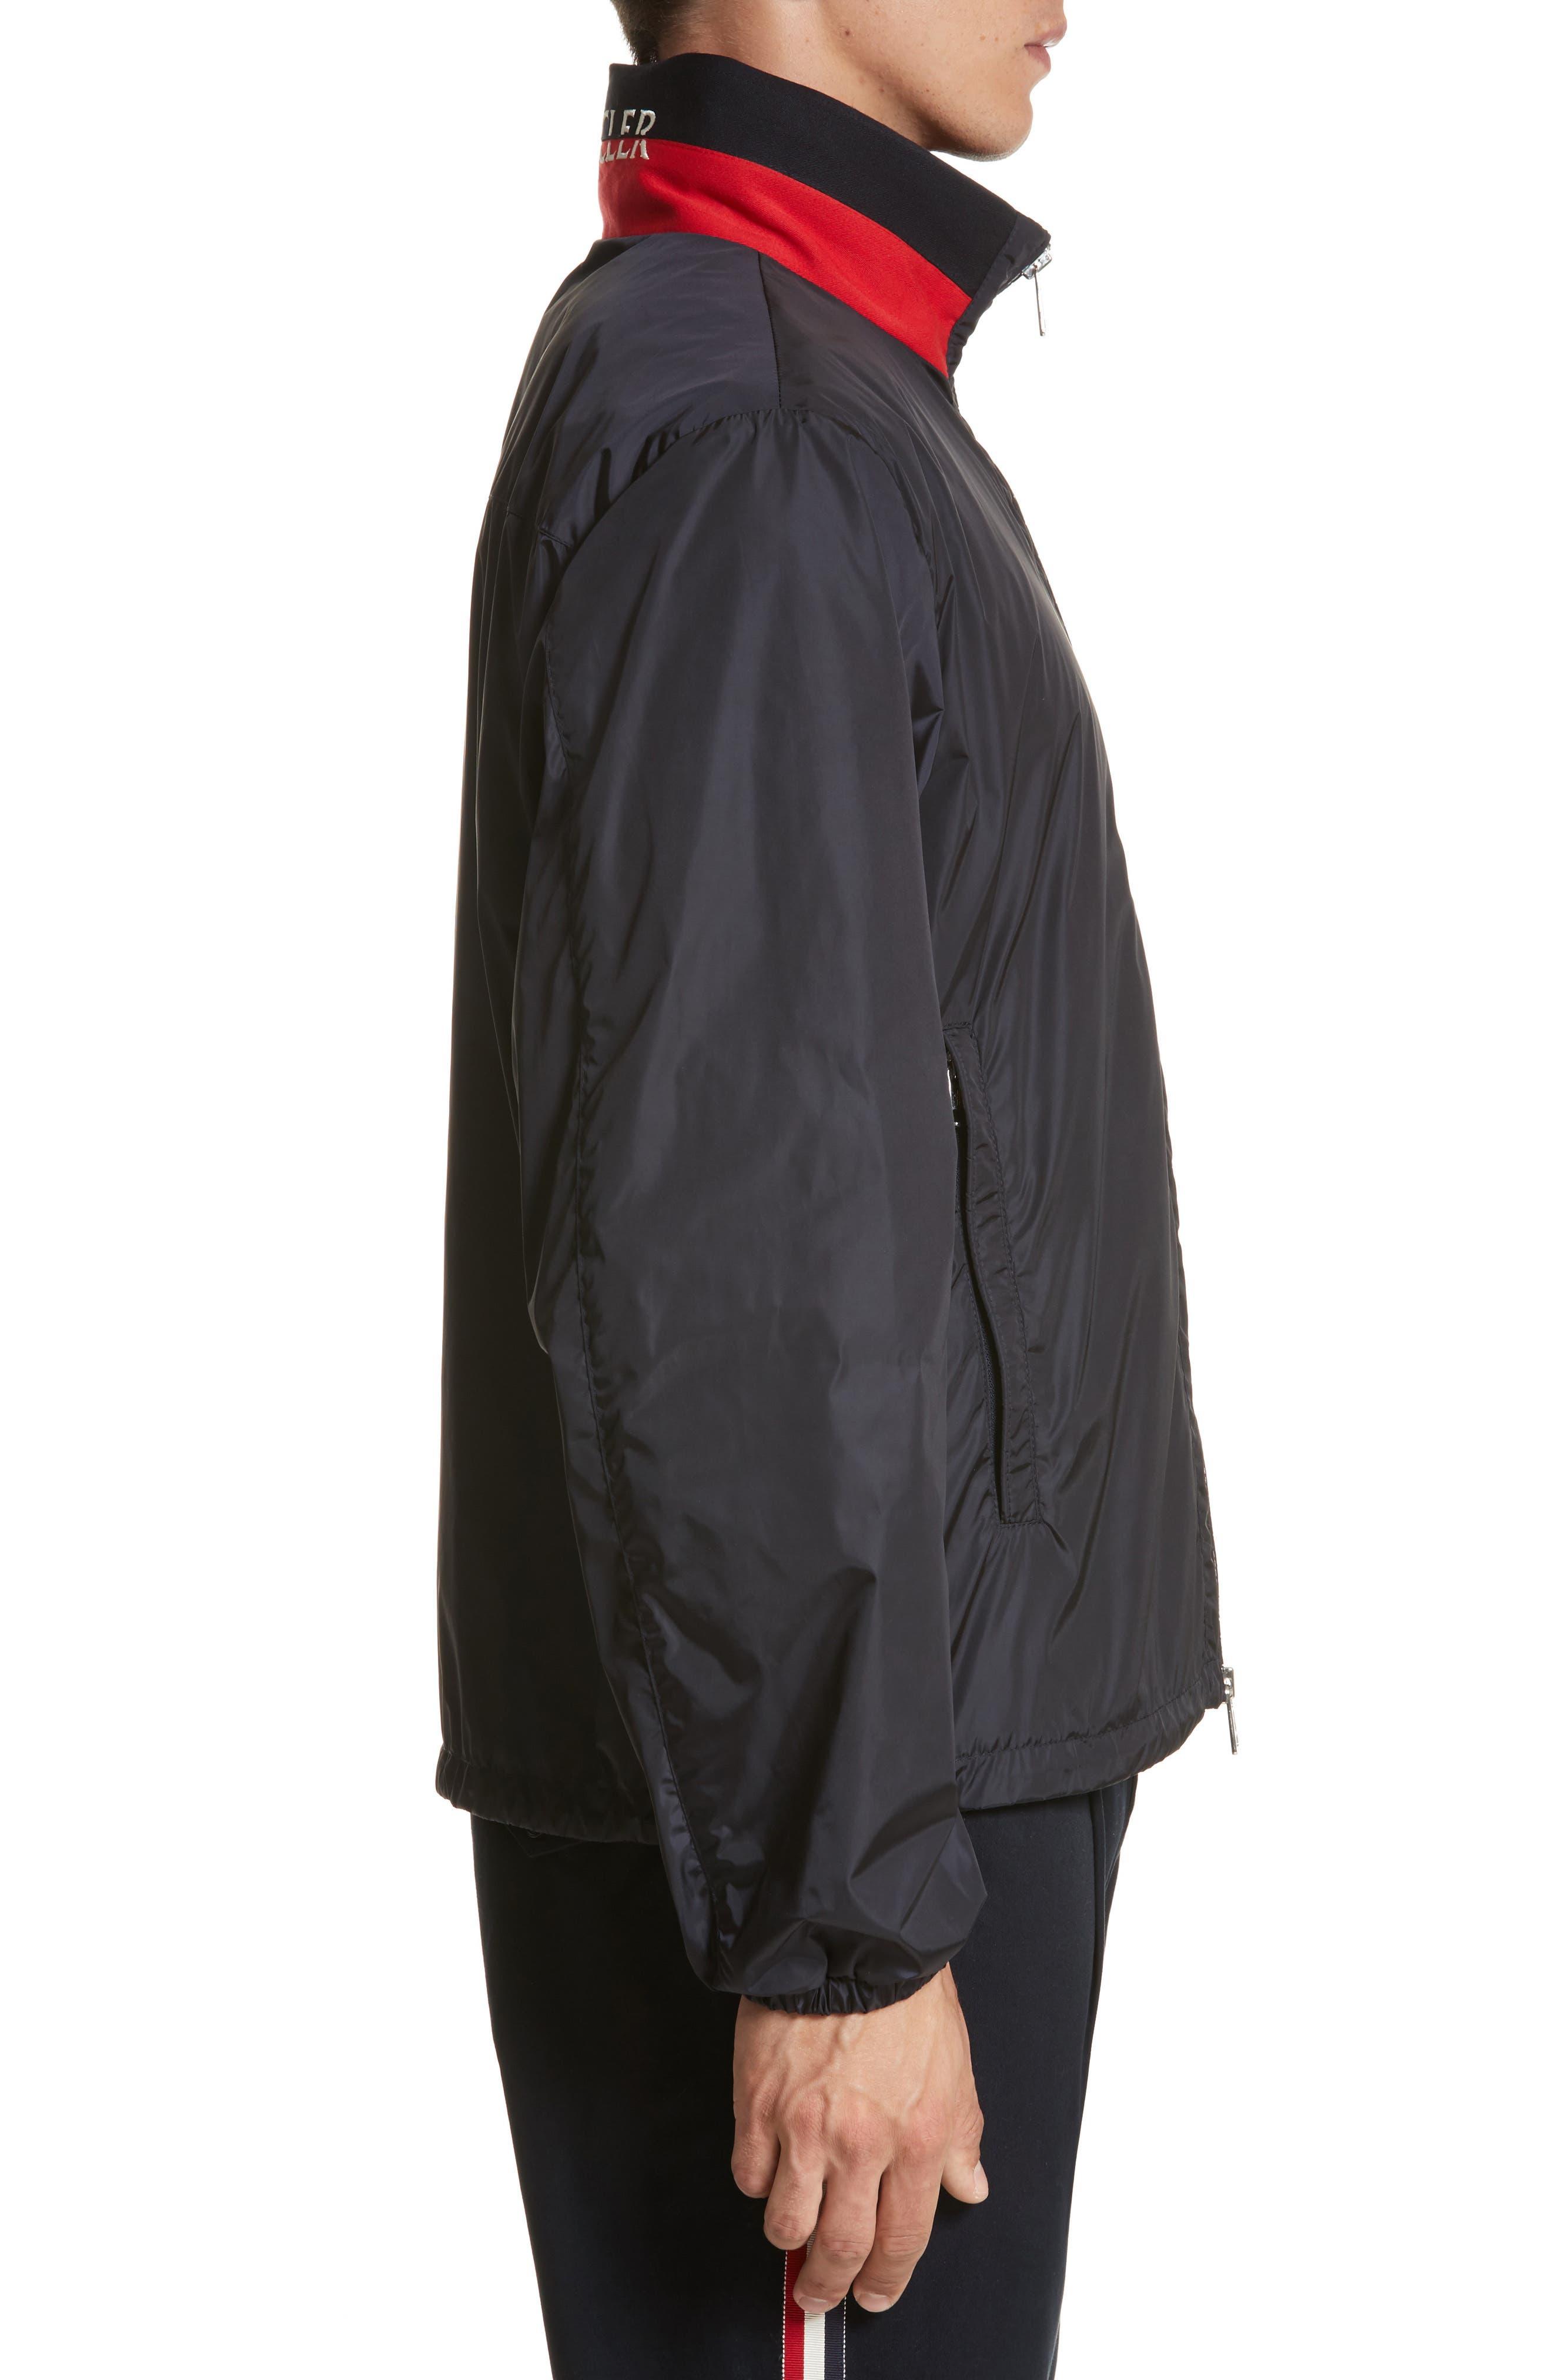 Goulier Nylon Jacket,                             Alternate thumbnail 3, color,                             Navy